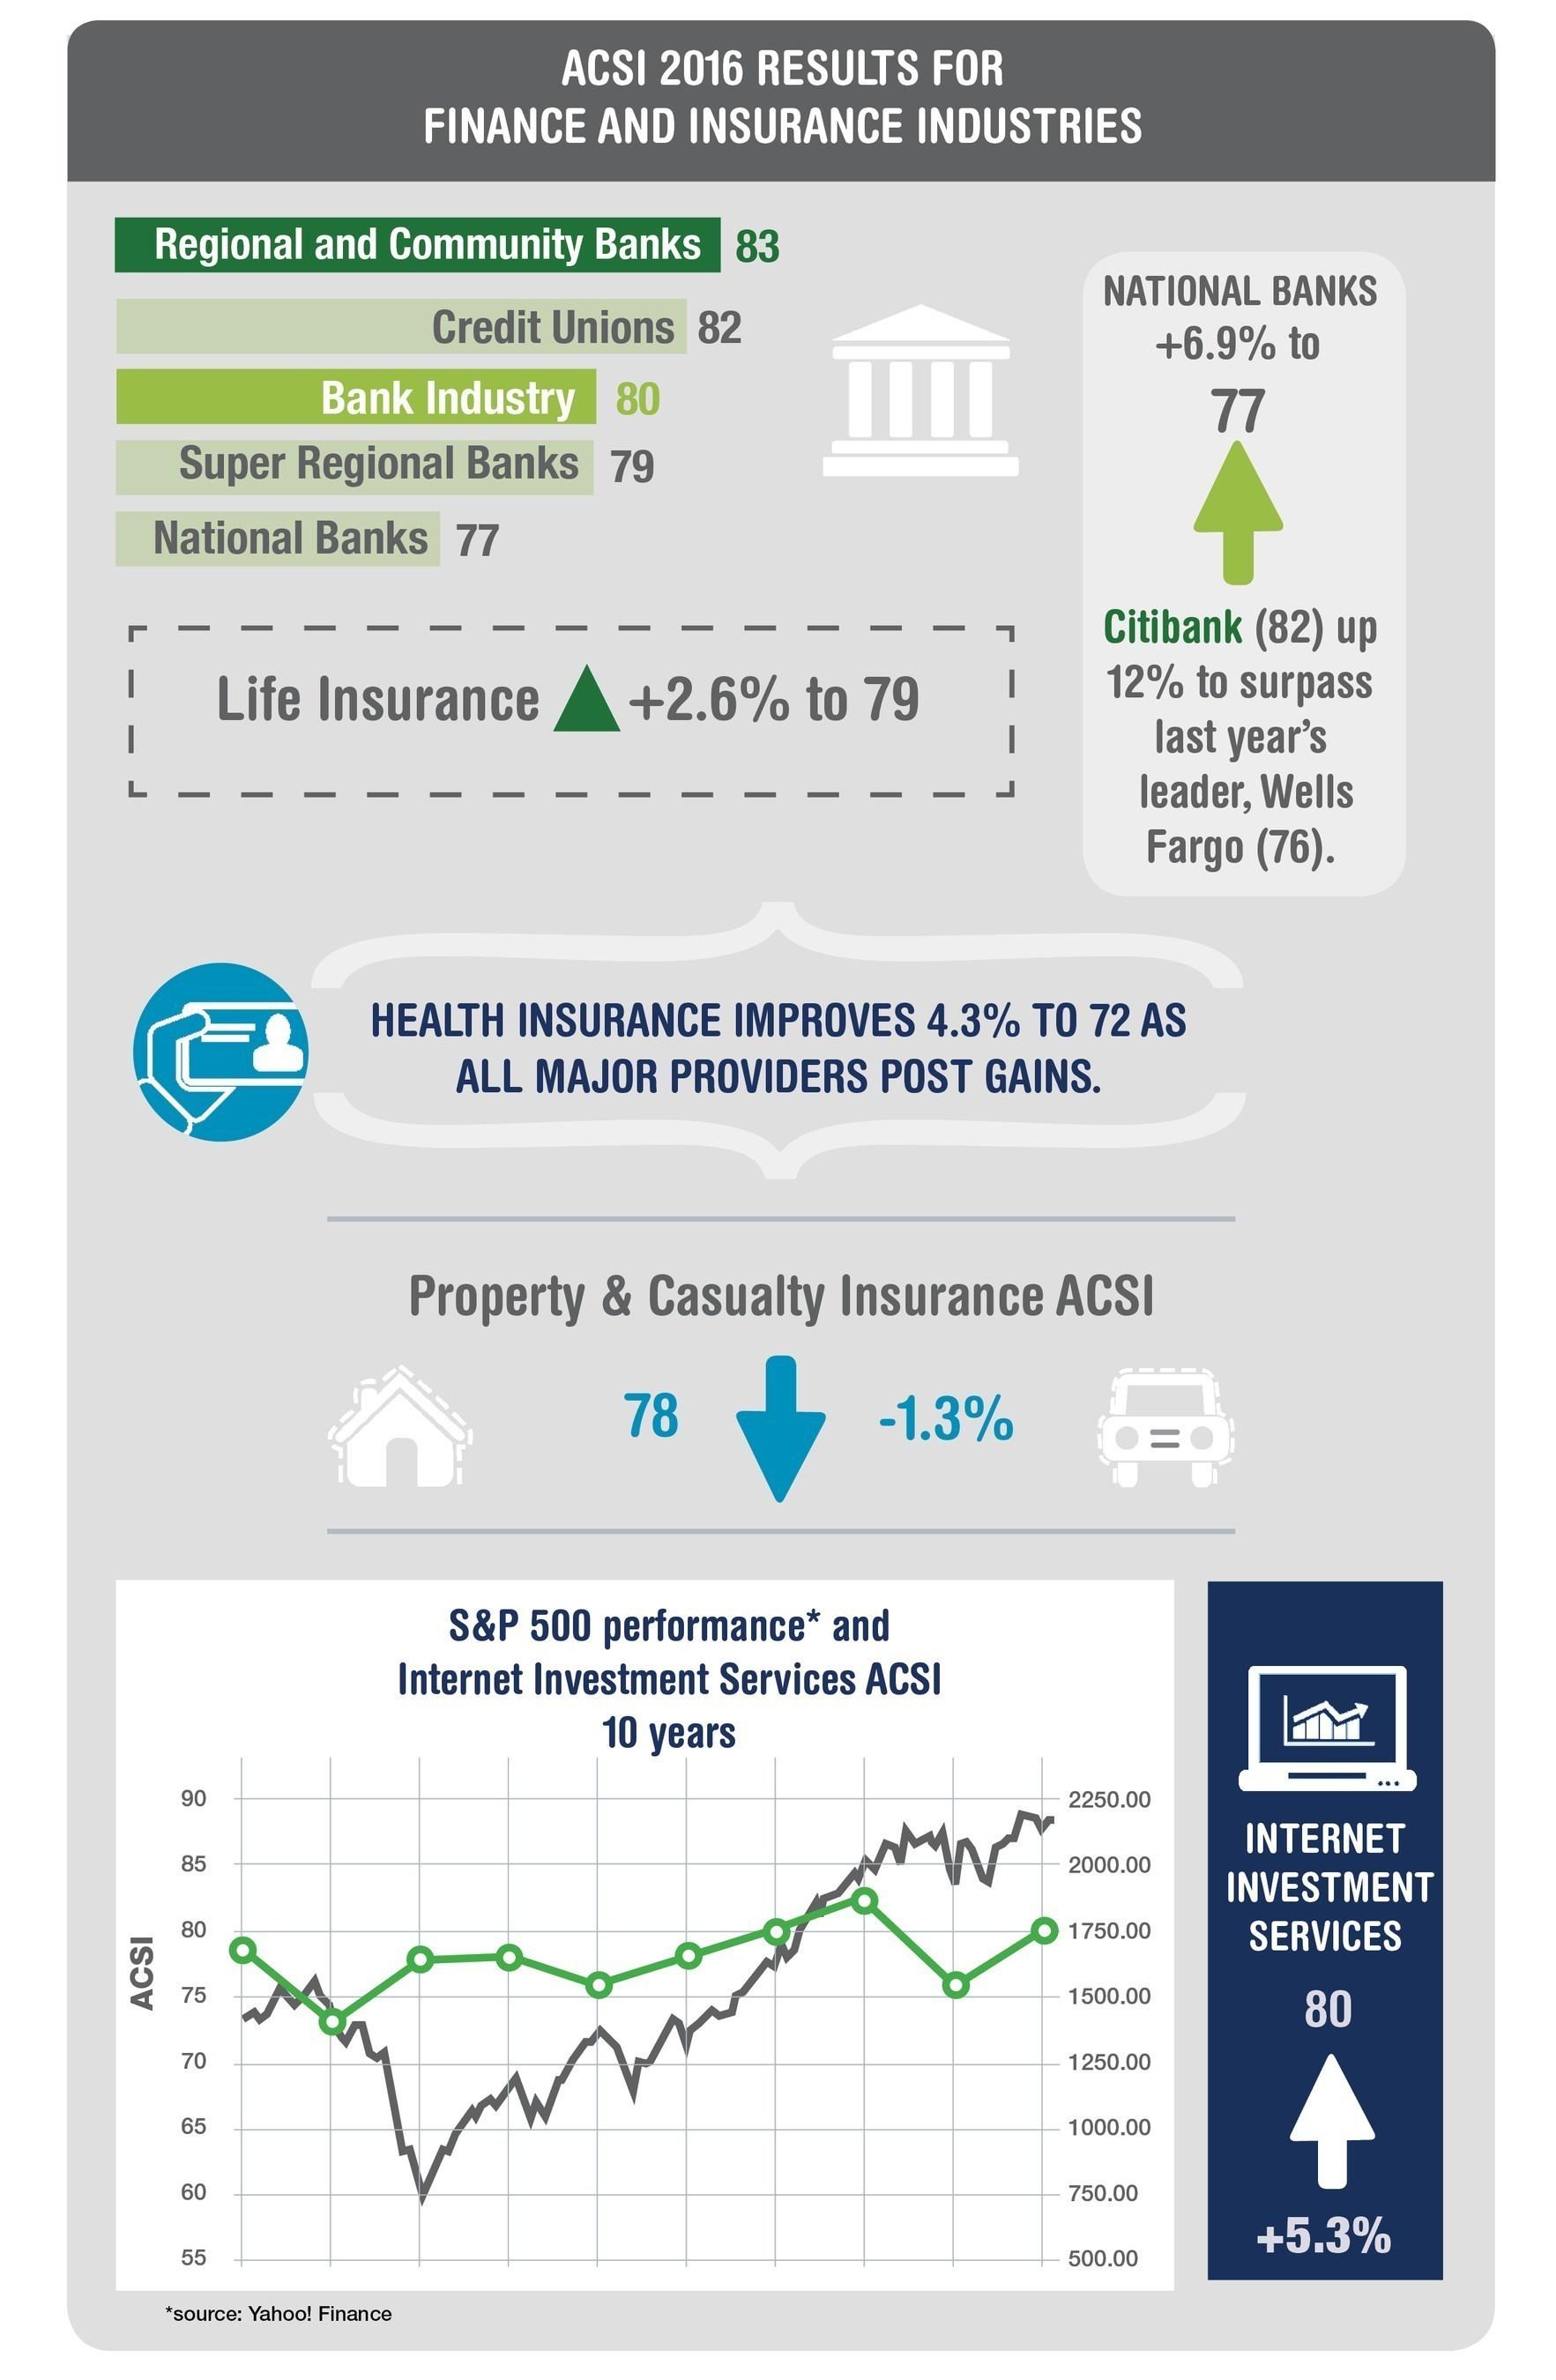 ACSI 2016 Finance & Insurance Report Highlights